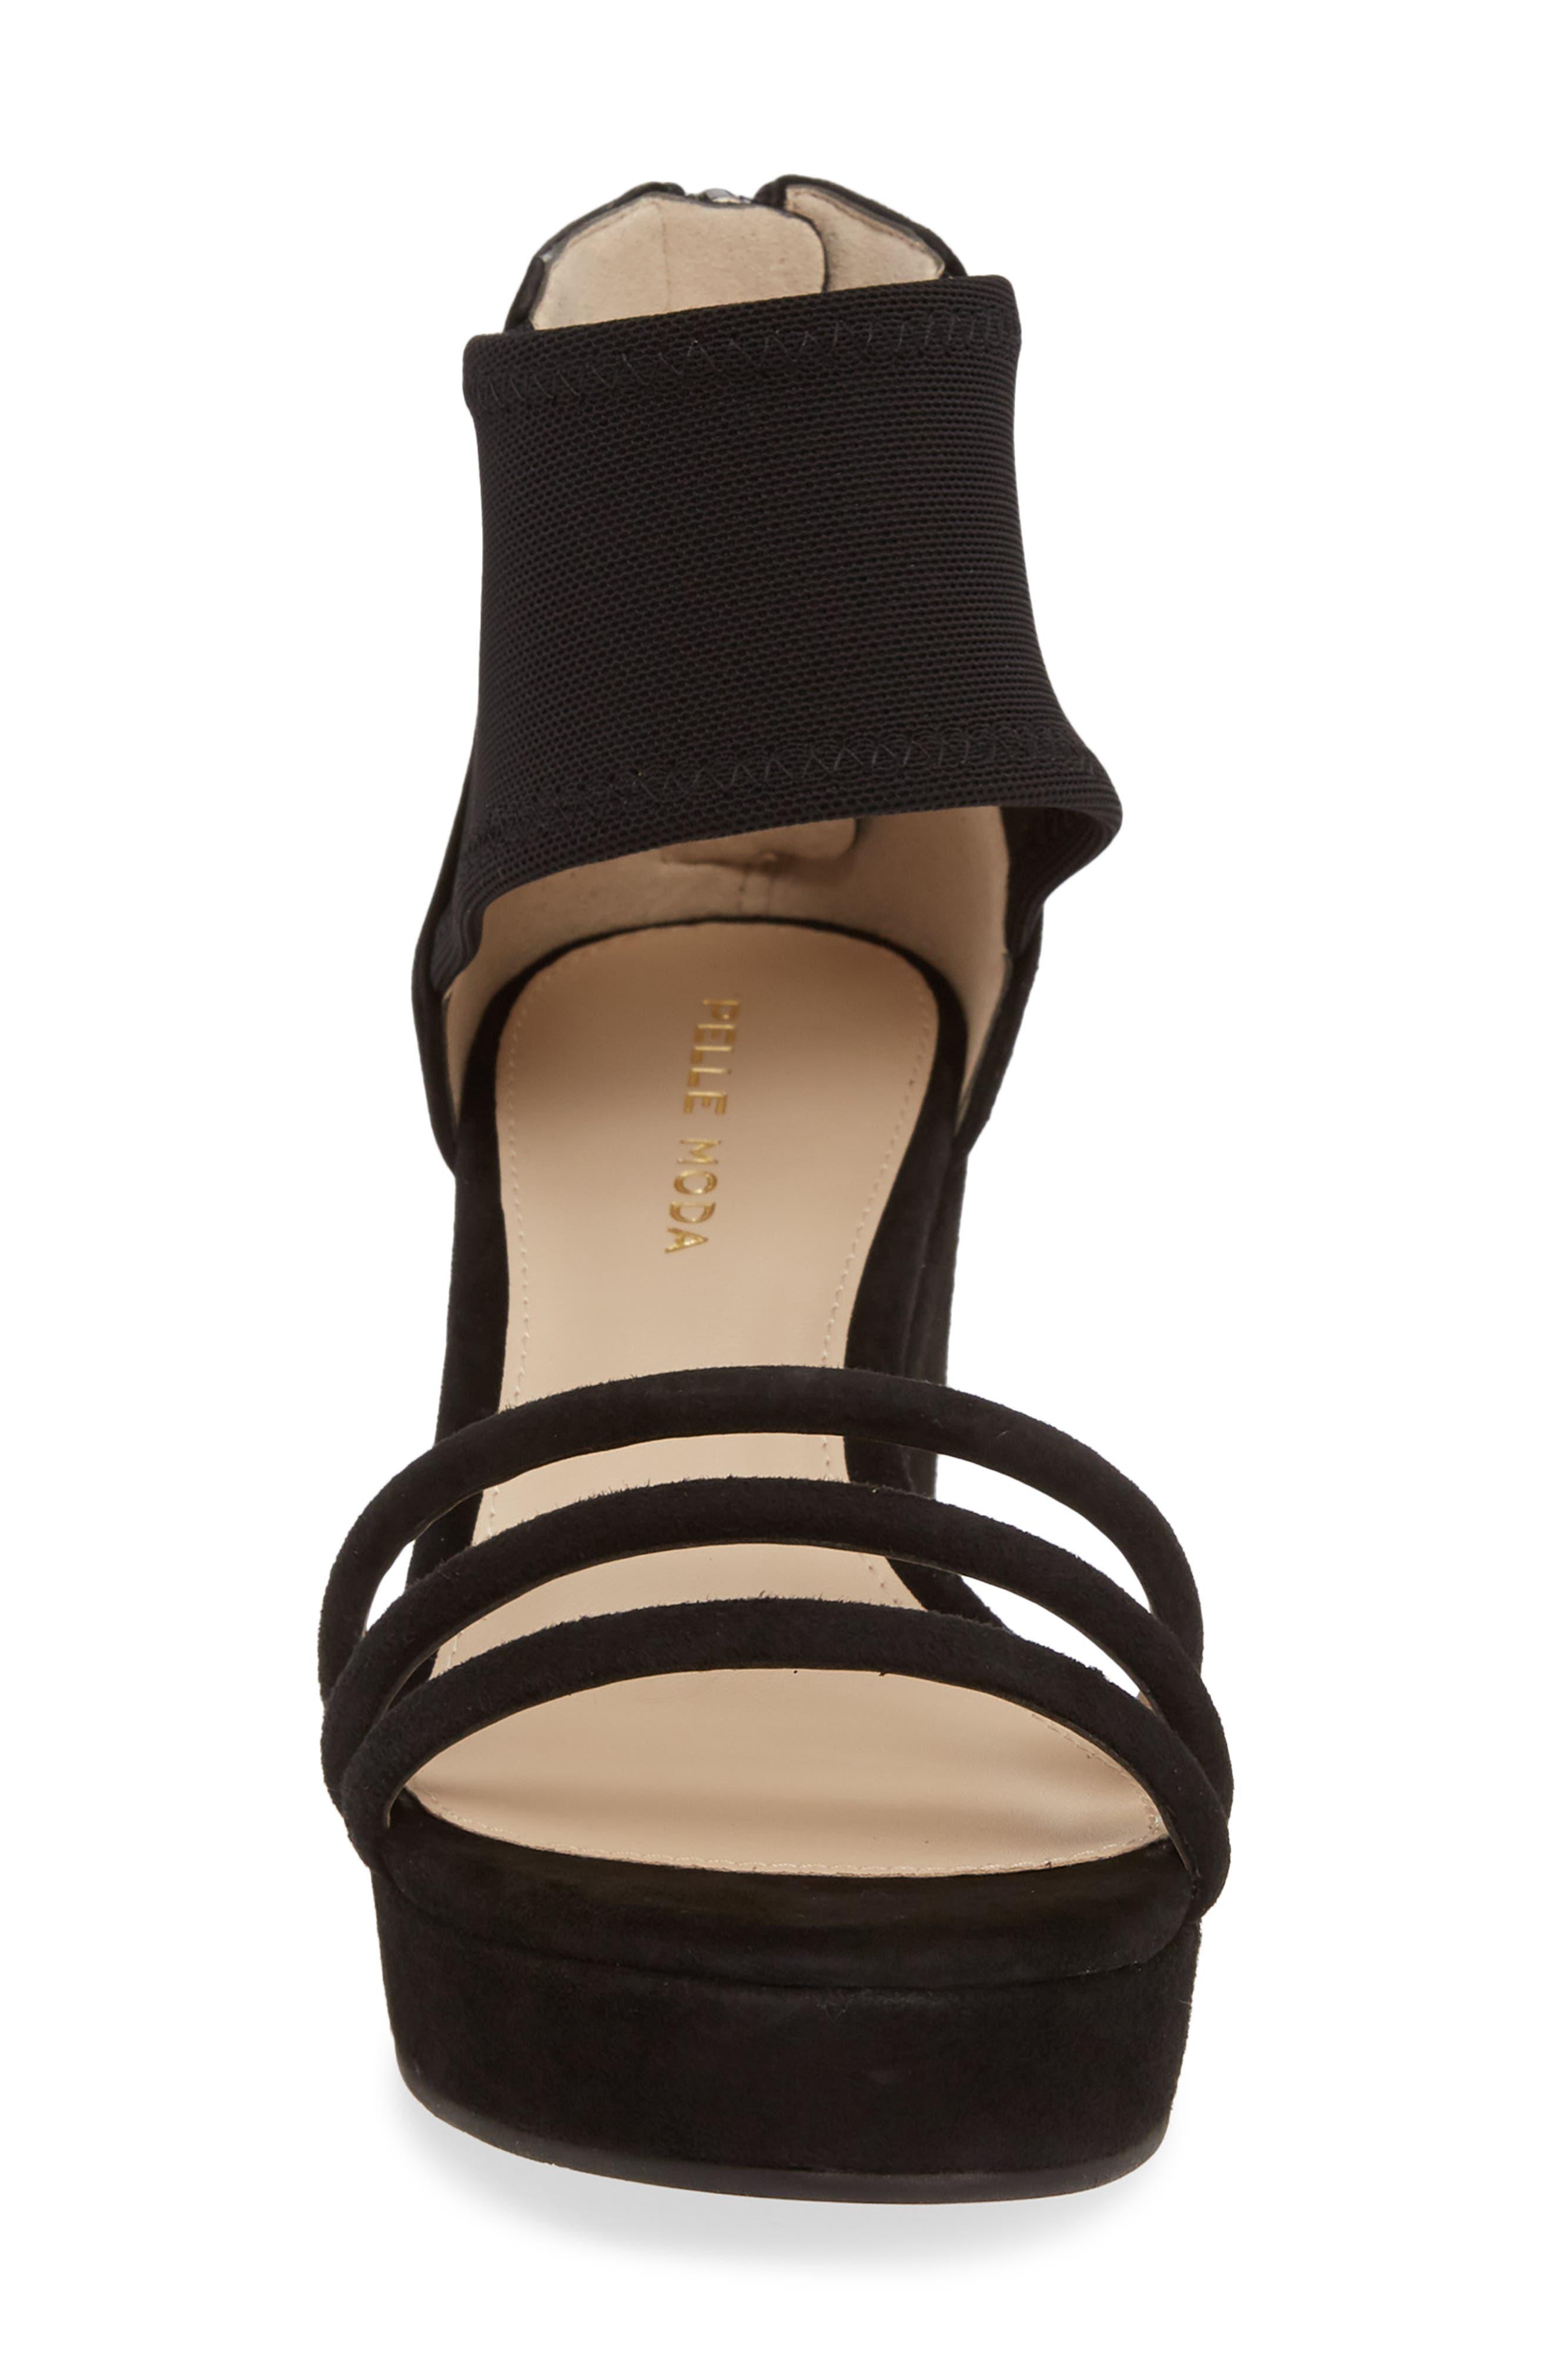 PELLE MODA, Katrice Platform Wedge Sandal, Alternate thumbnail 4, color, BLACK SUEDE